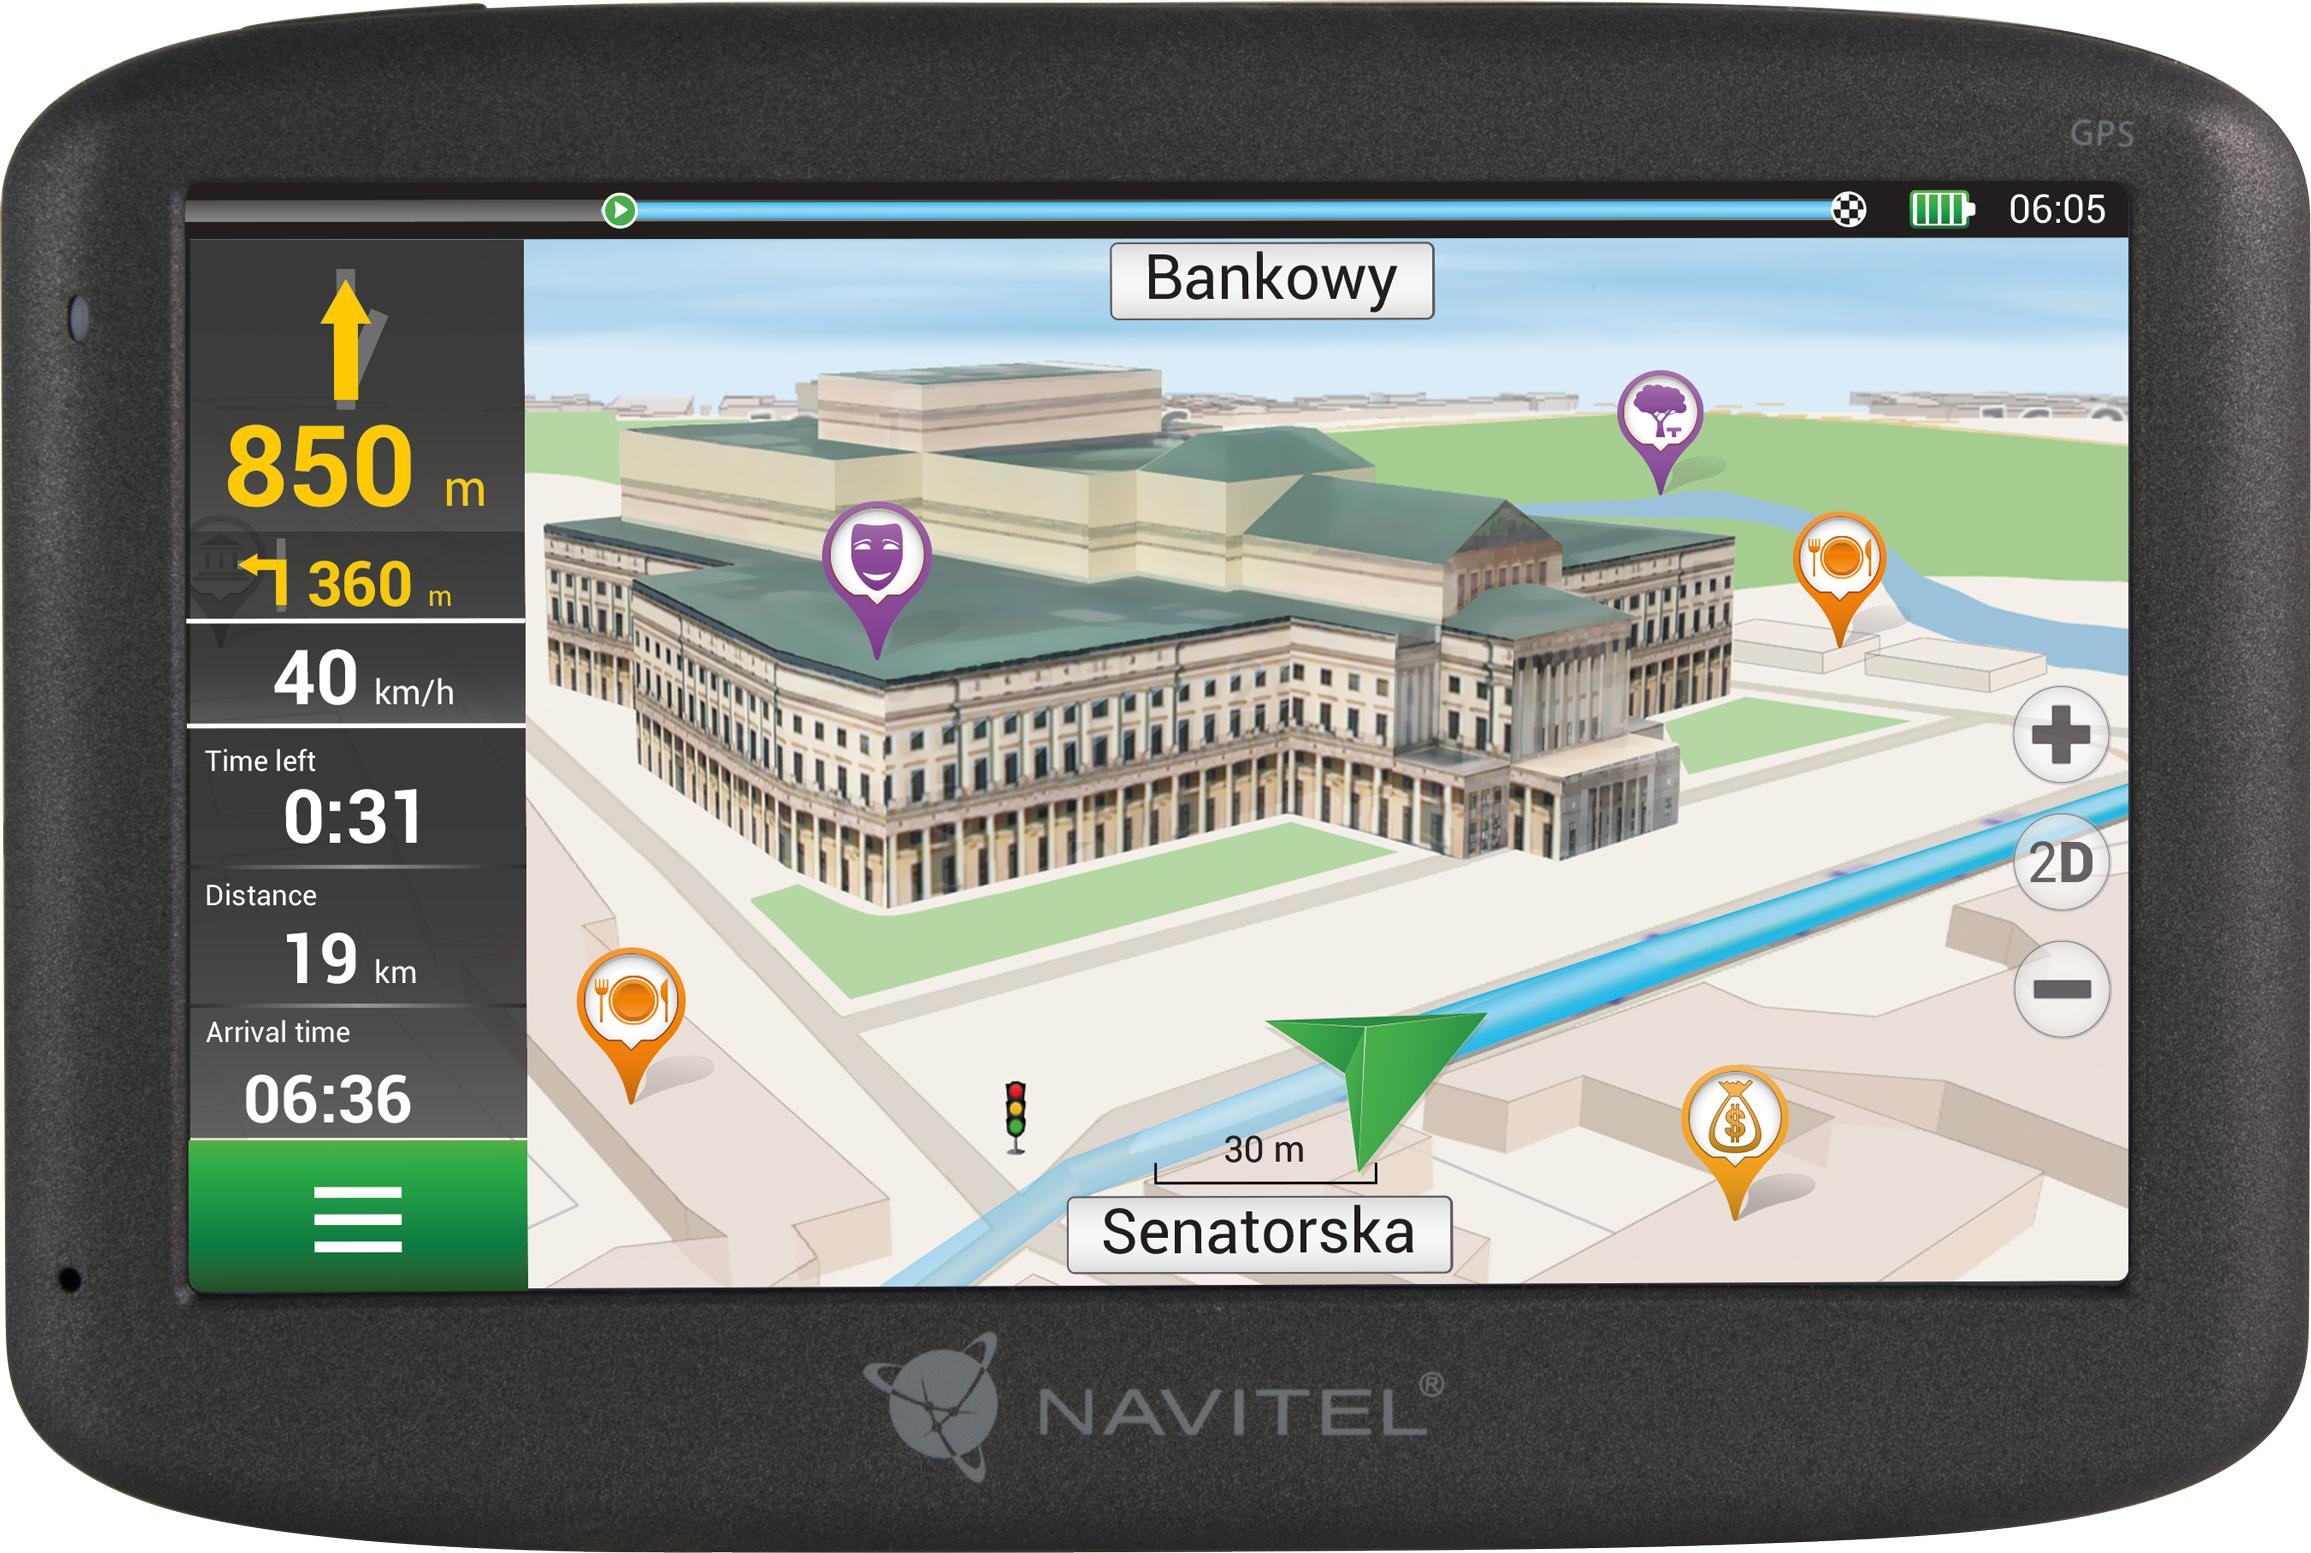 Navigationssystem NAVMS400 NAVITEL NAVMS400 original kvalite